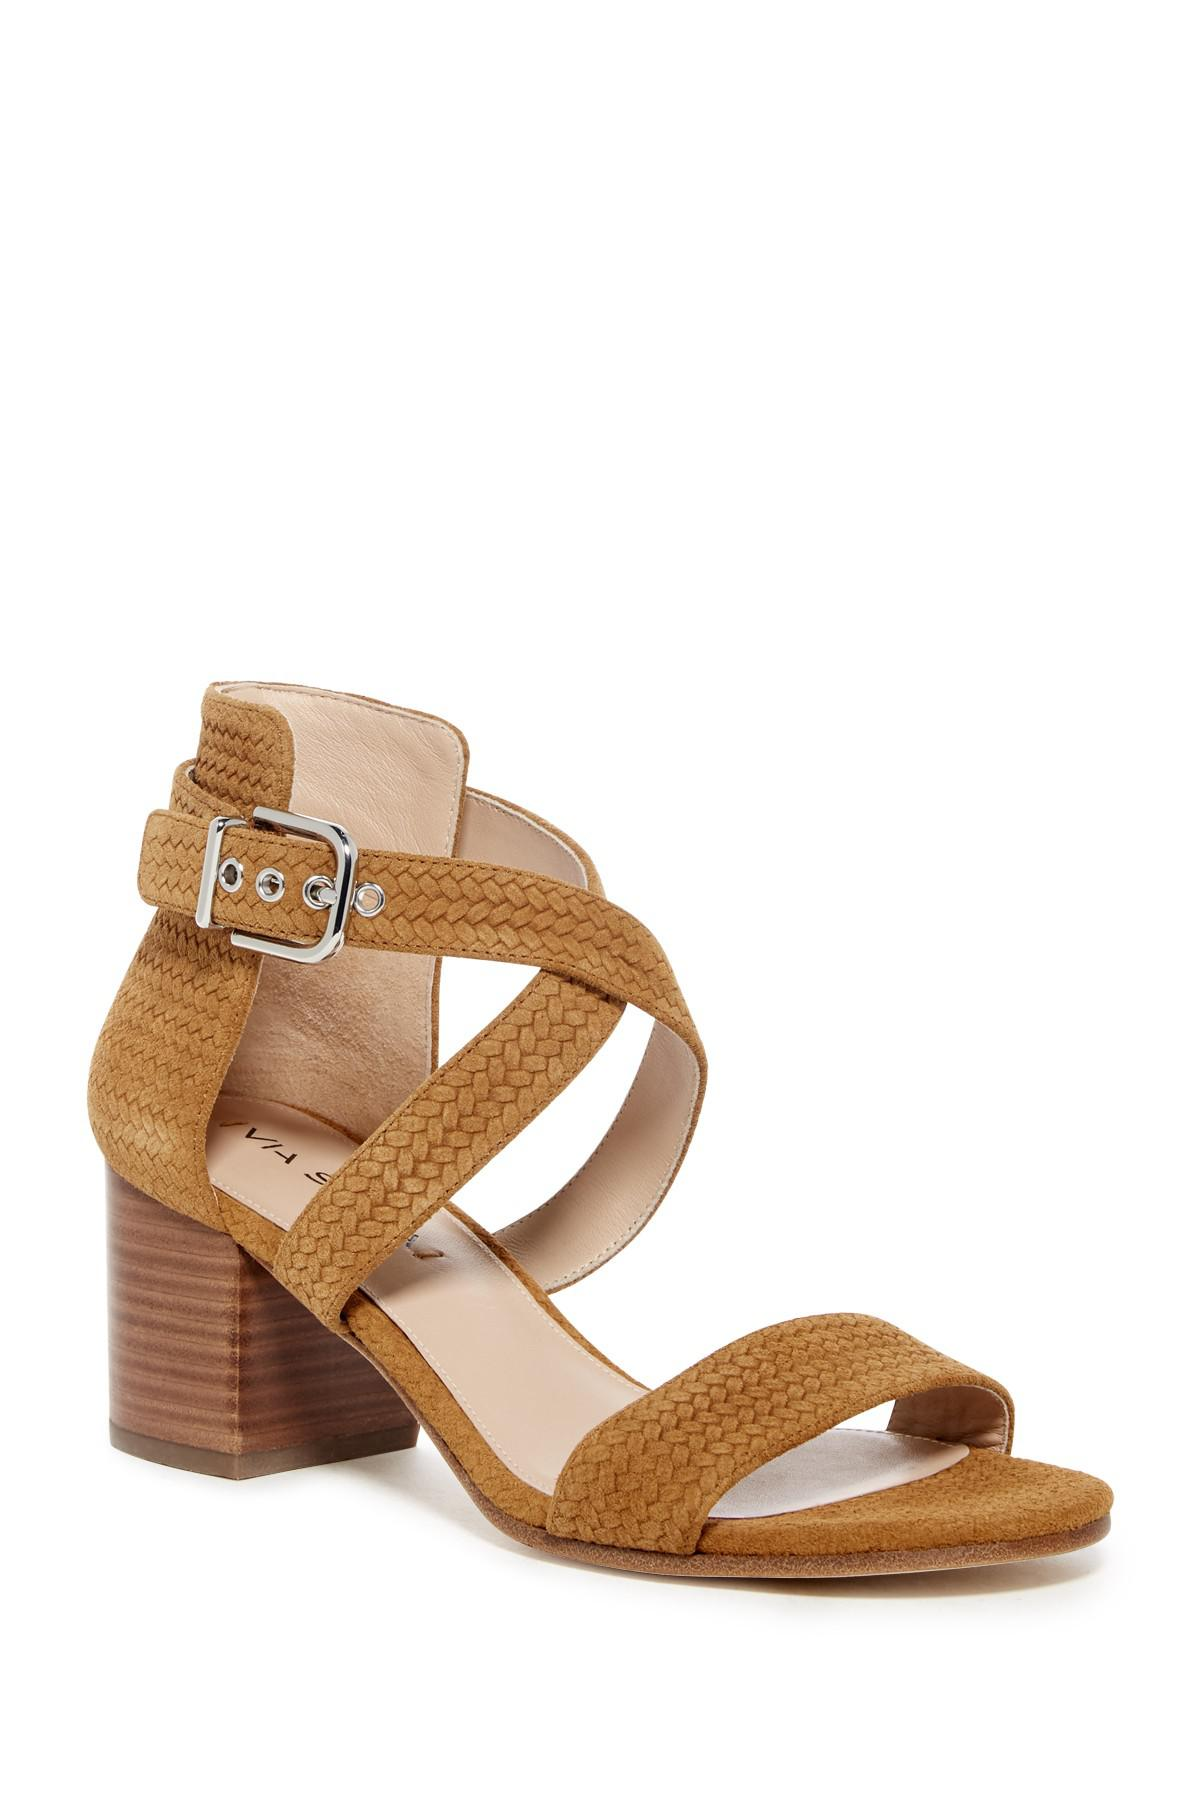 Via Spiga Shoes Sale